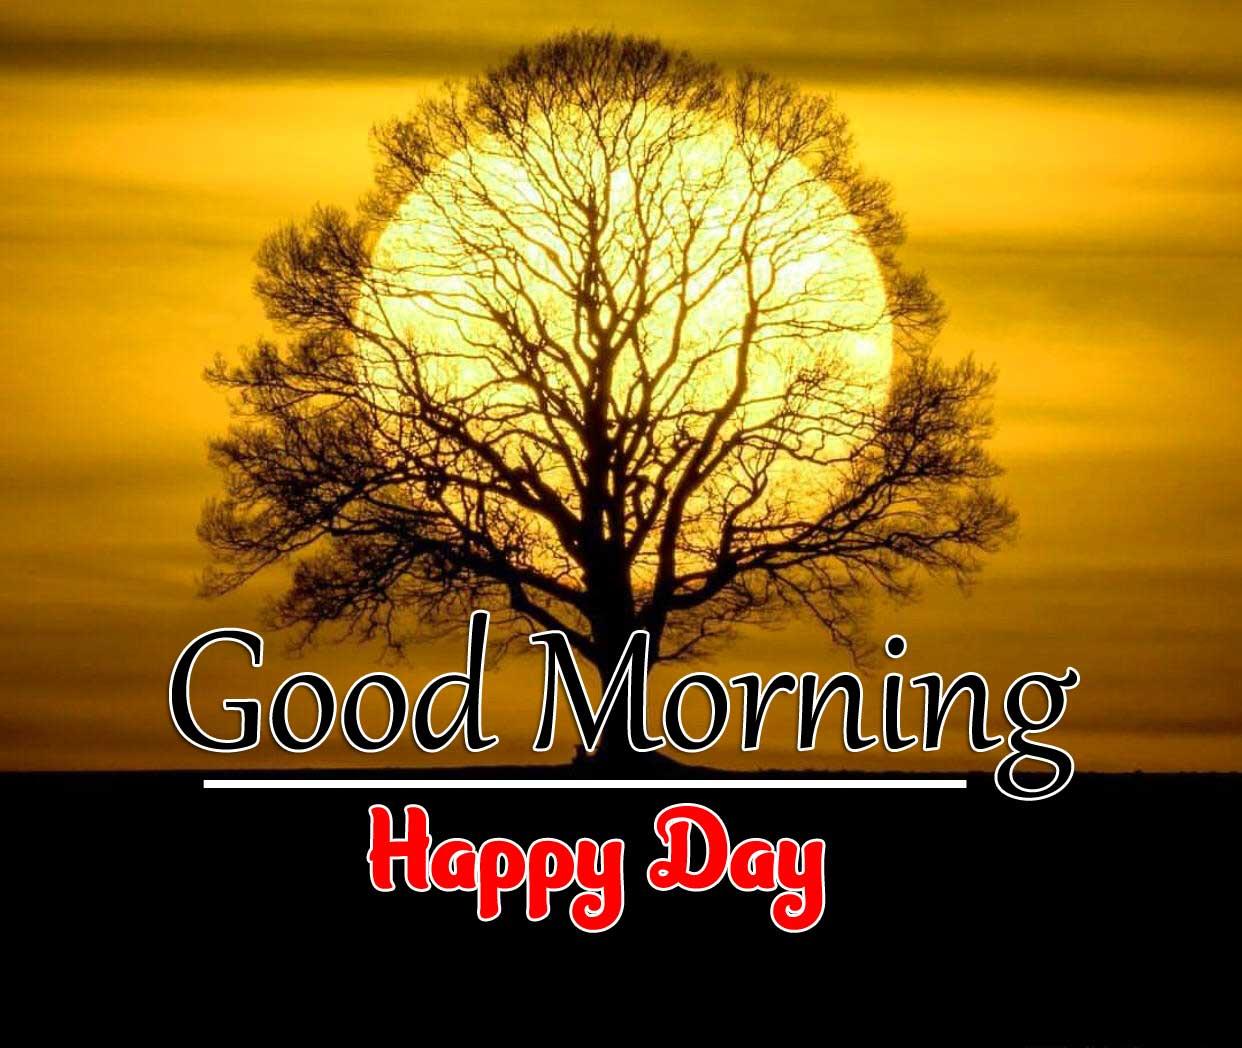 Beautiful Good Morning Free Images